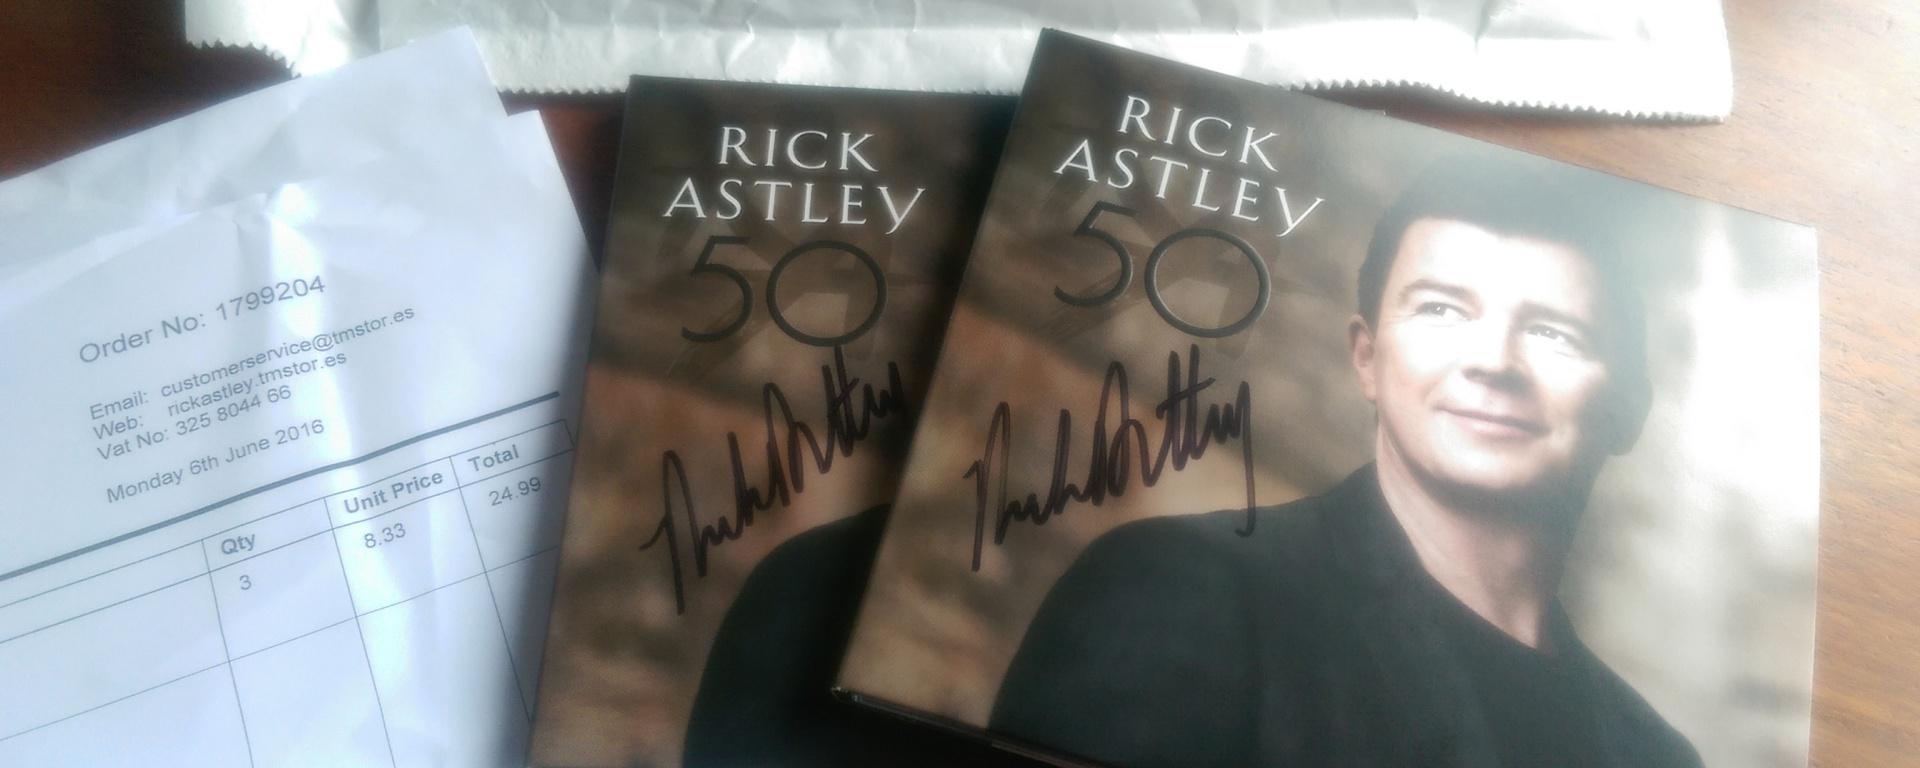 rick astley cd